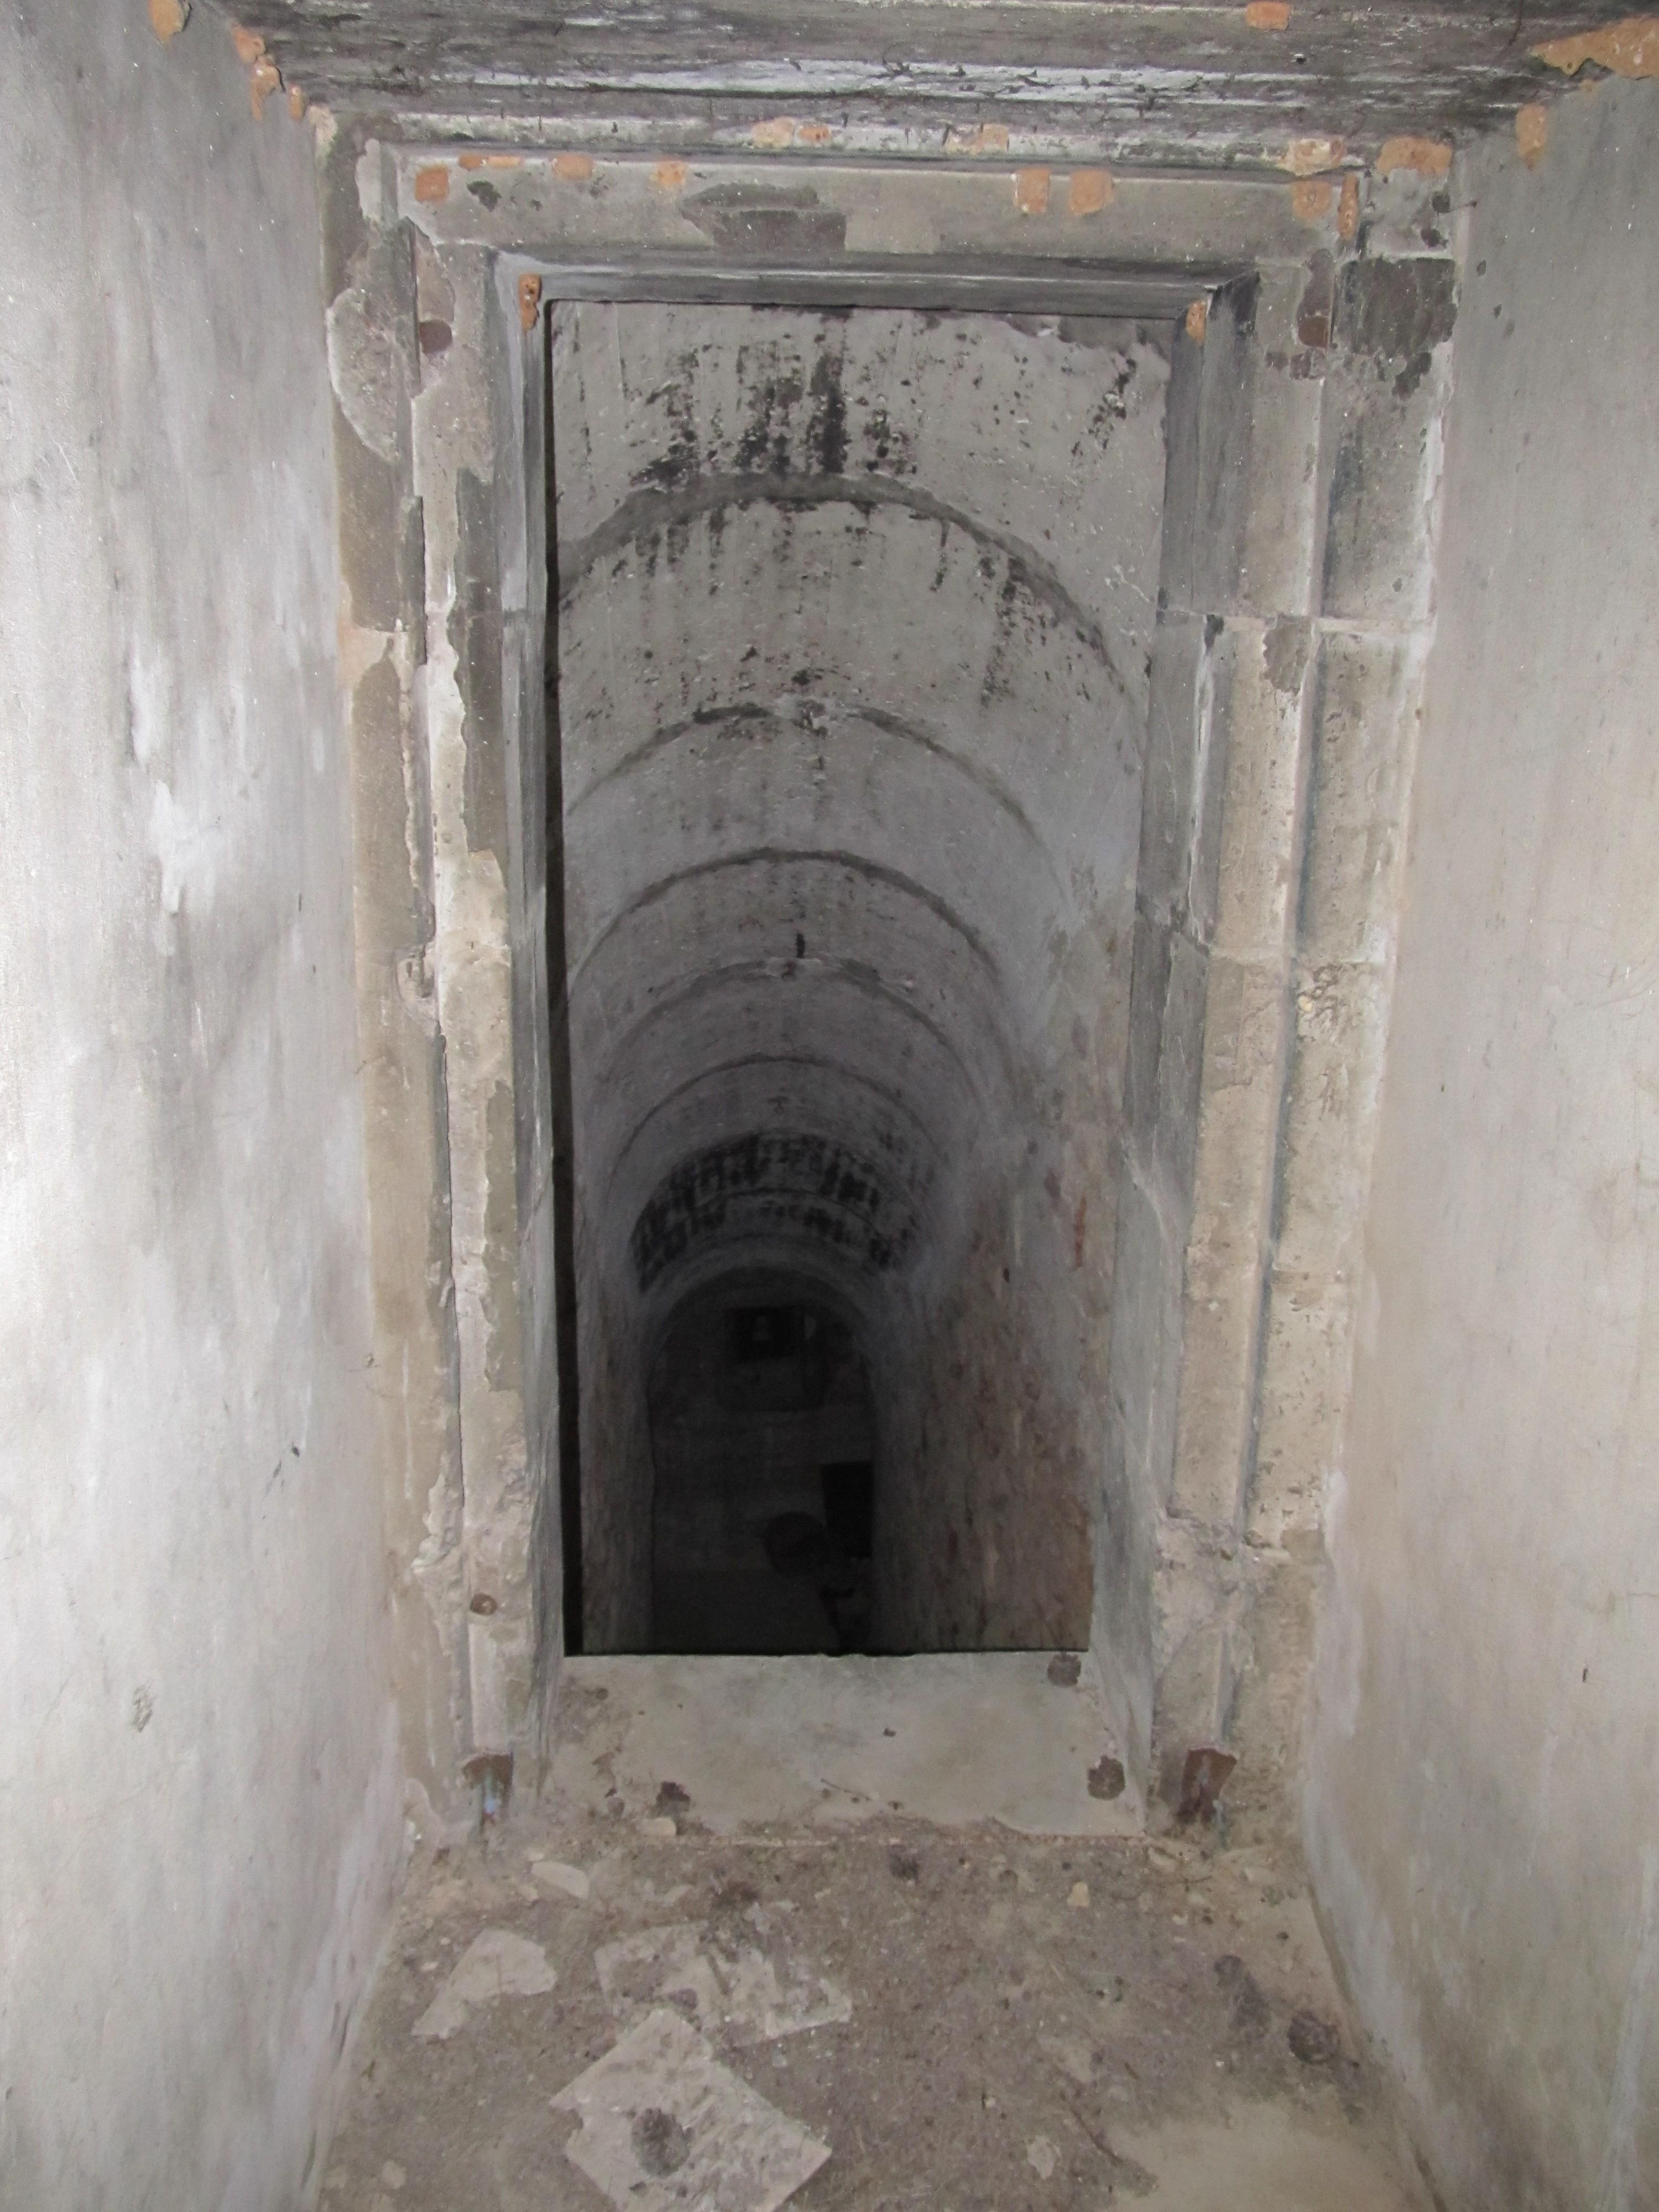 The entrance corridor is 10 meters underground.